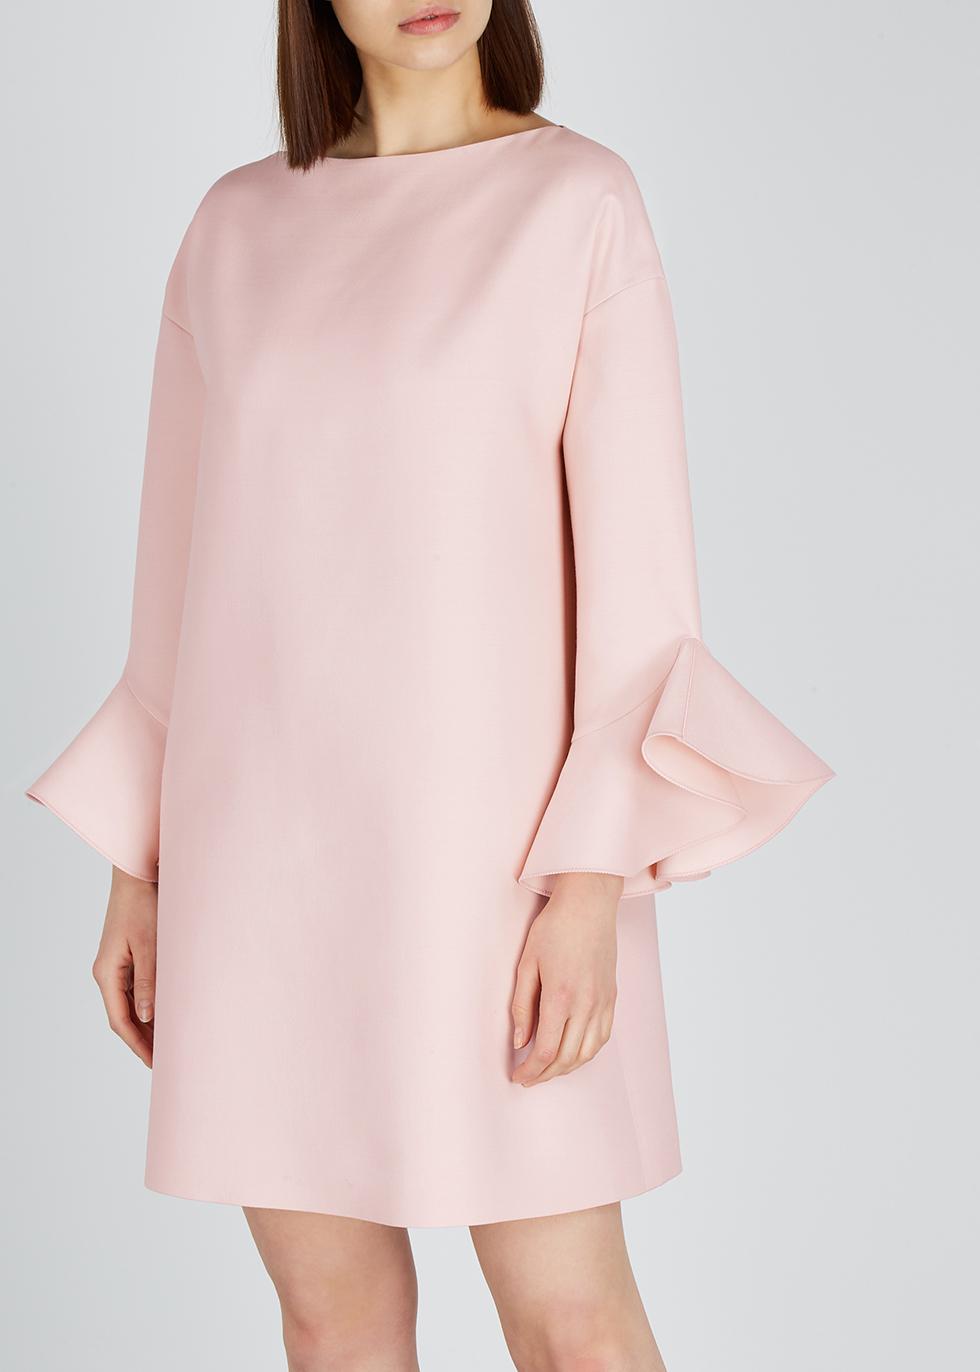 Light pink wool-blend shift dress - Valentino